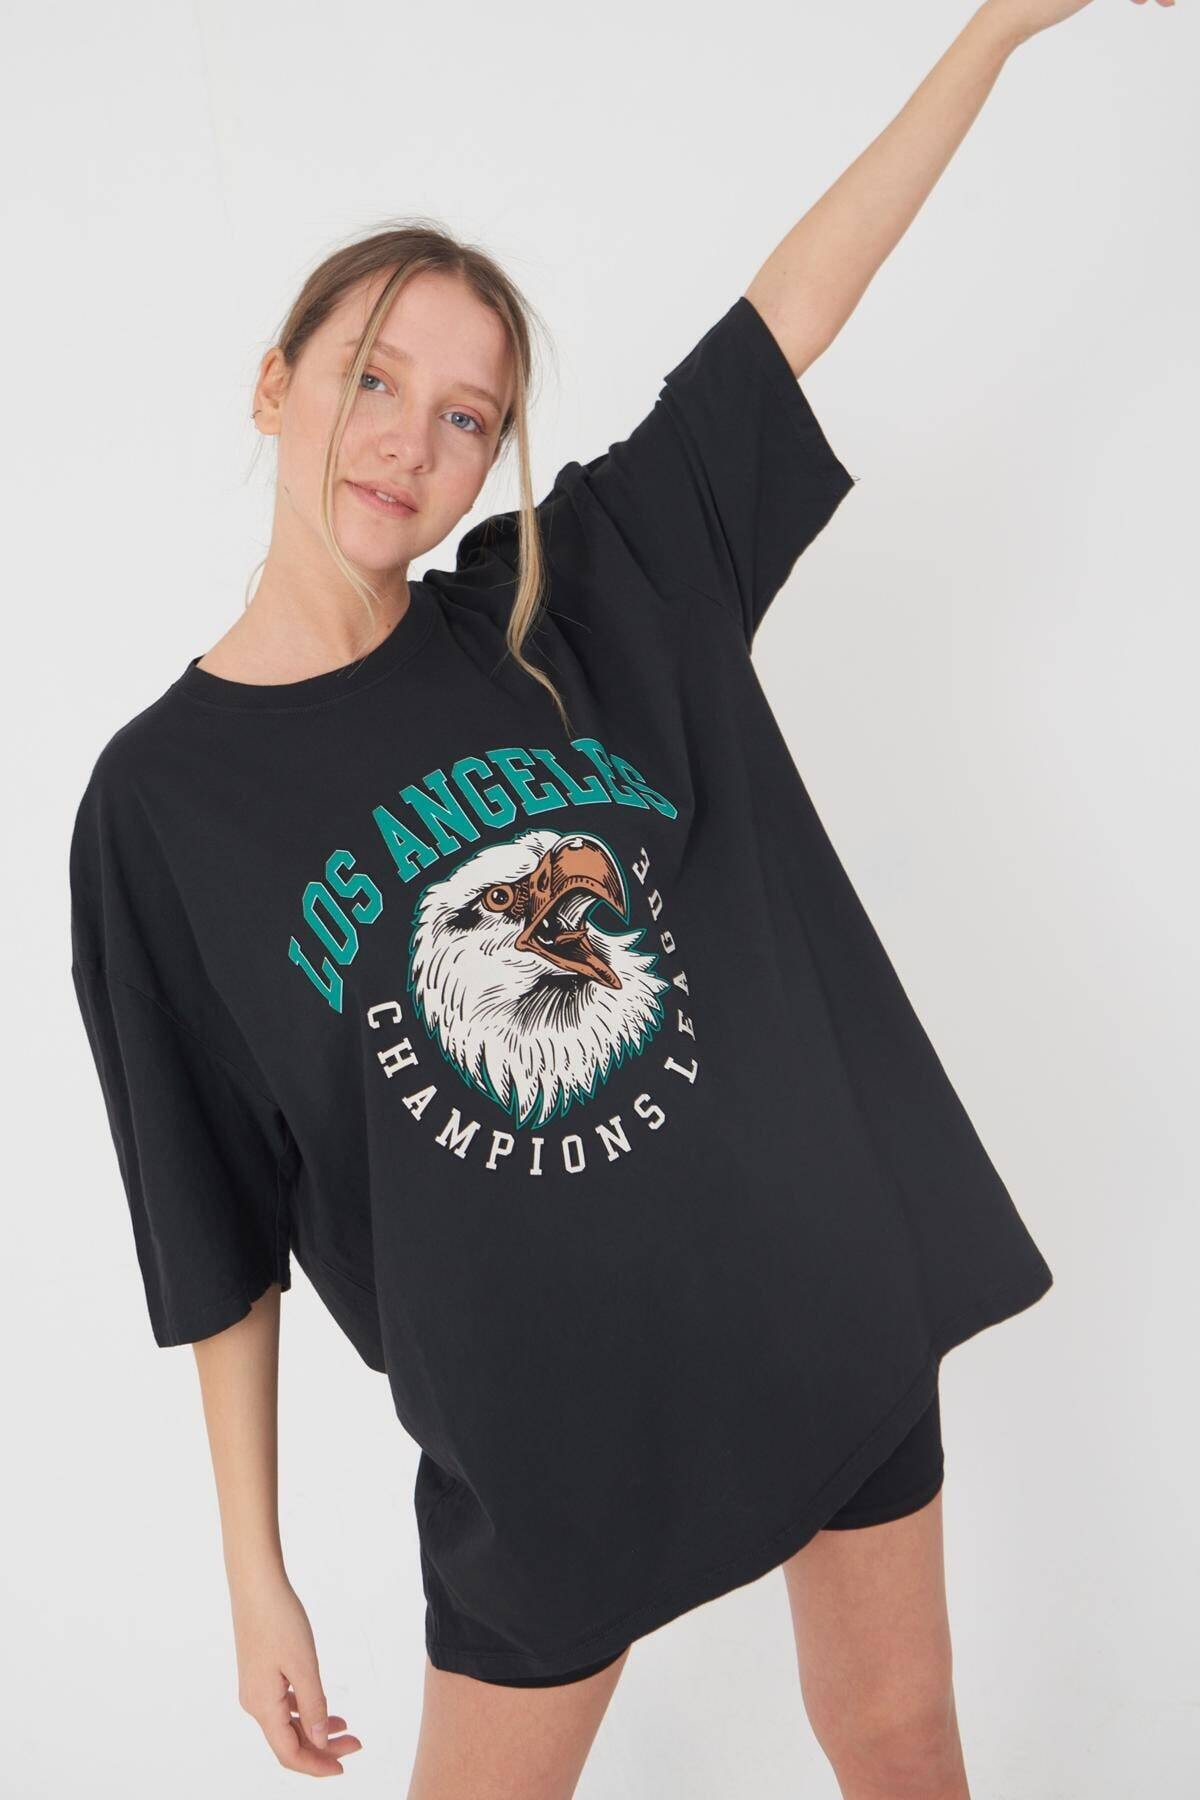 Addax Kadın Füme Baskılı T-Shirt P9420 - C5 Adx-0000022126